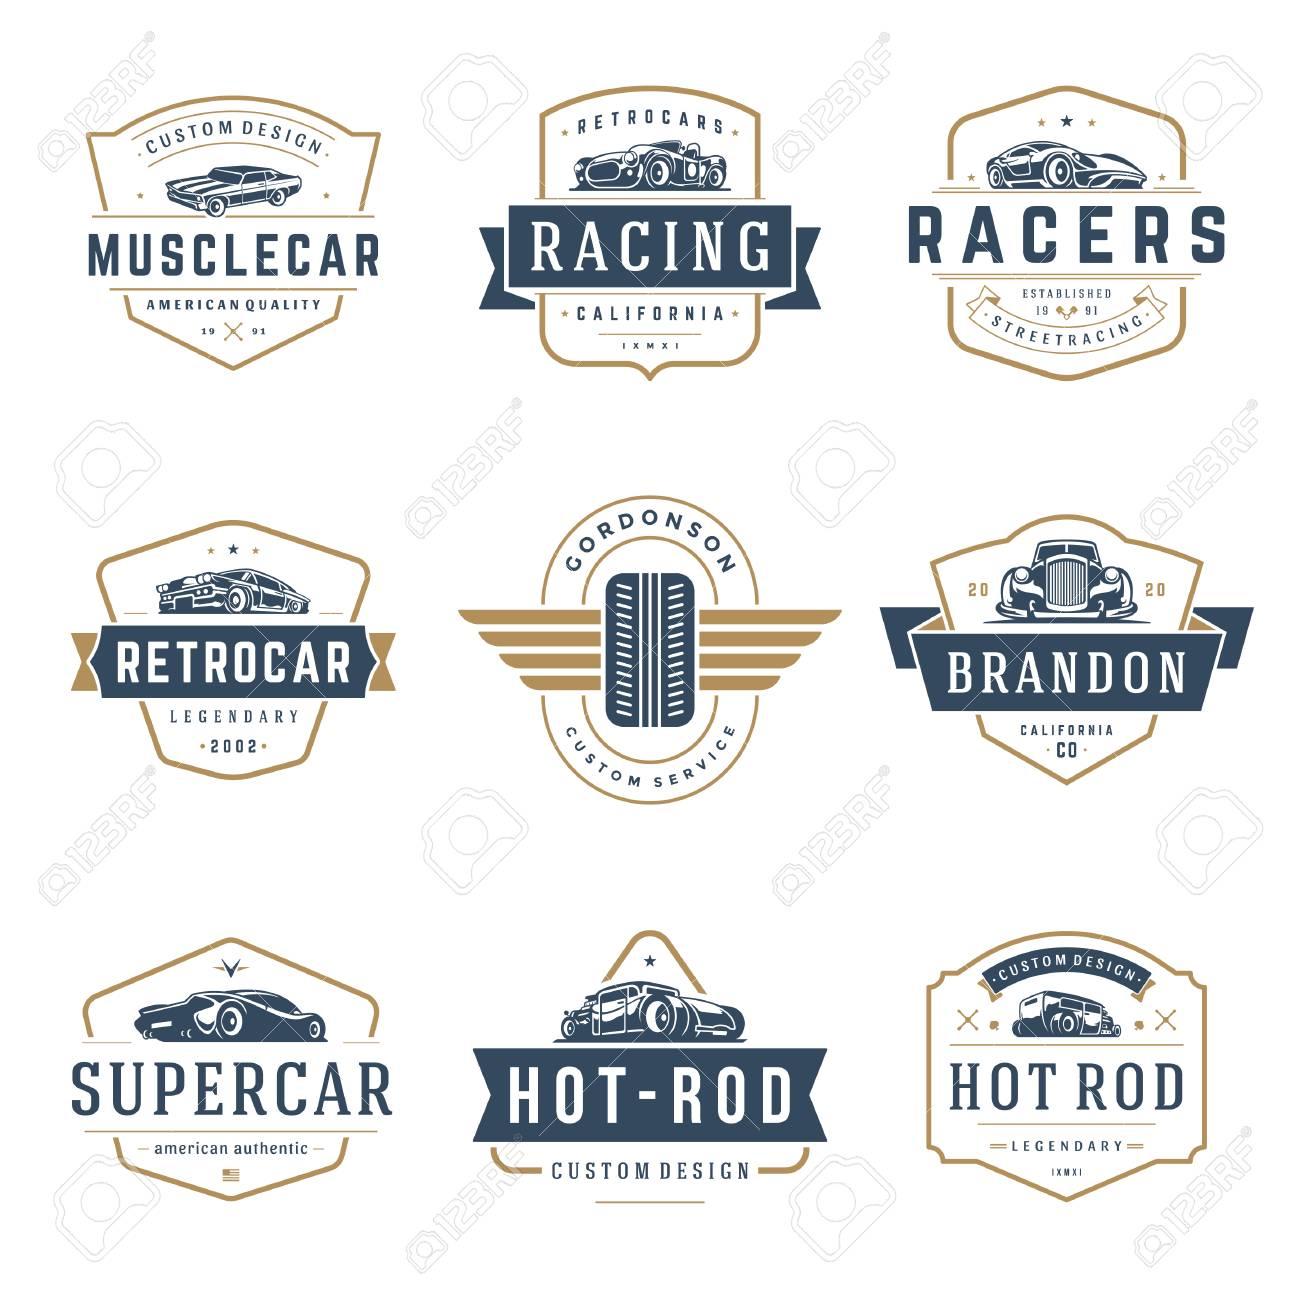 Car Logos Templates Vector Design Elements Set Vintage Style